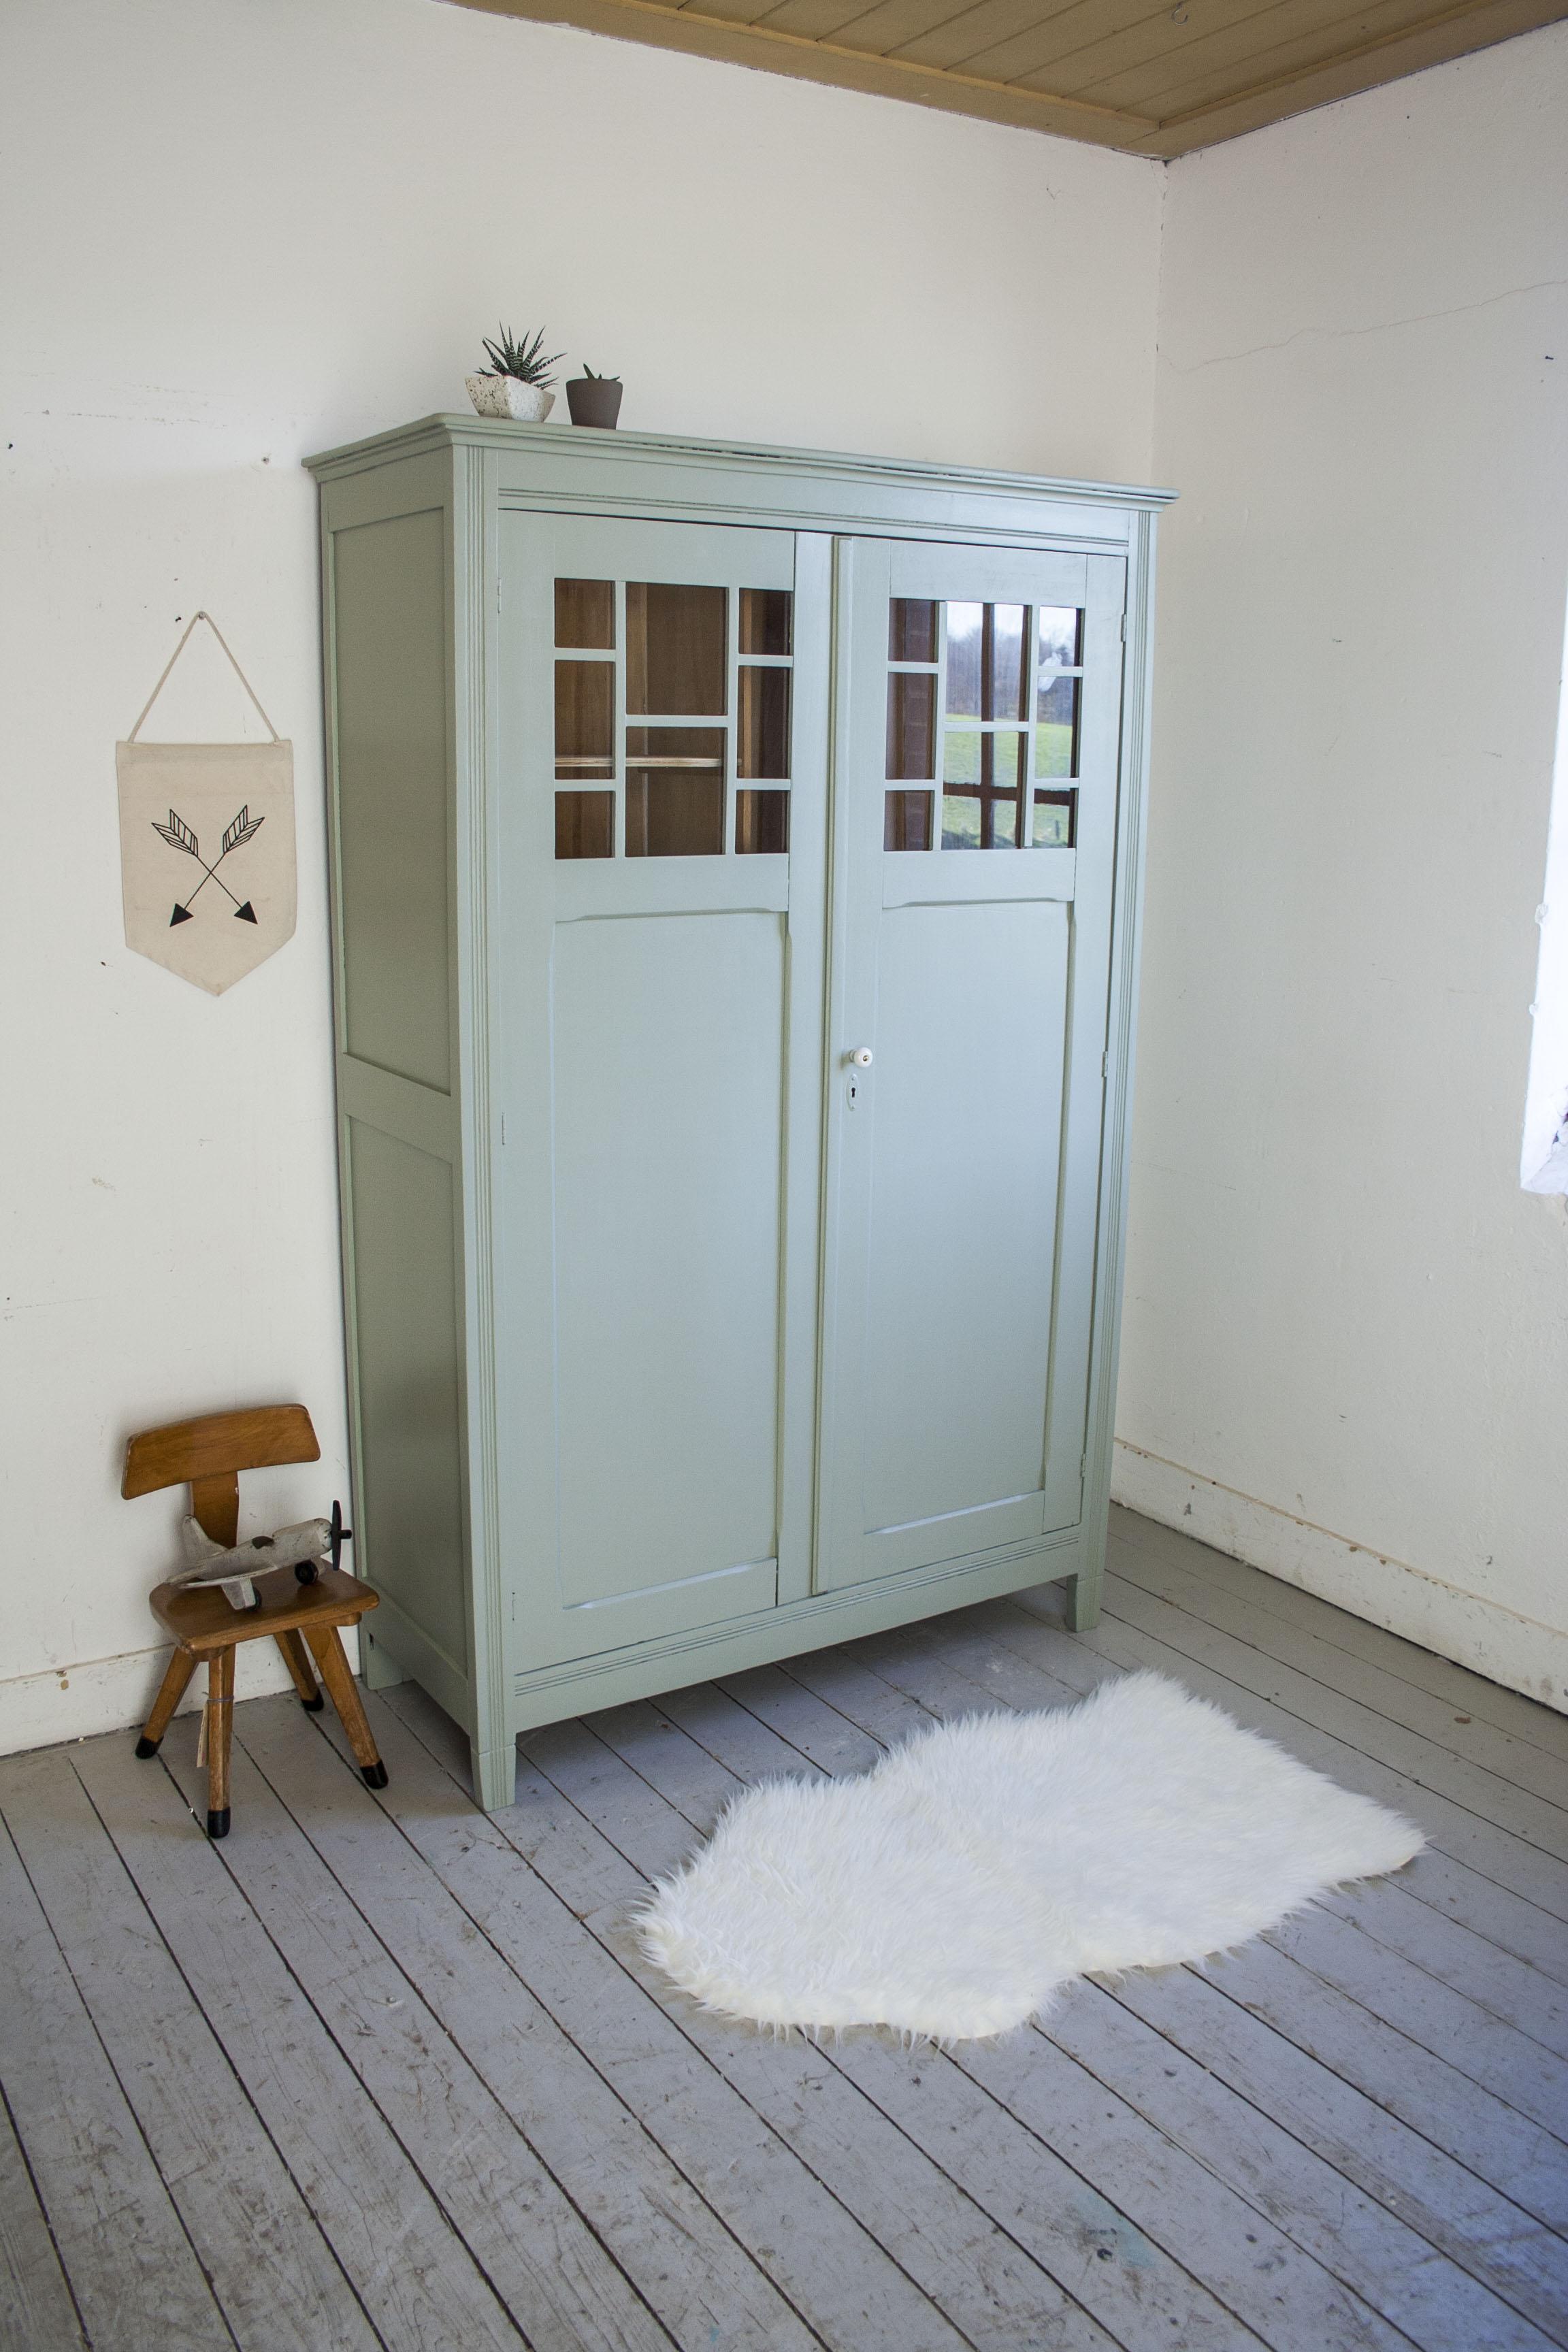 Grijsgroene kledingkast met ruitjes - Firma Zoethout.jpg